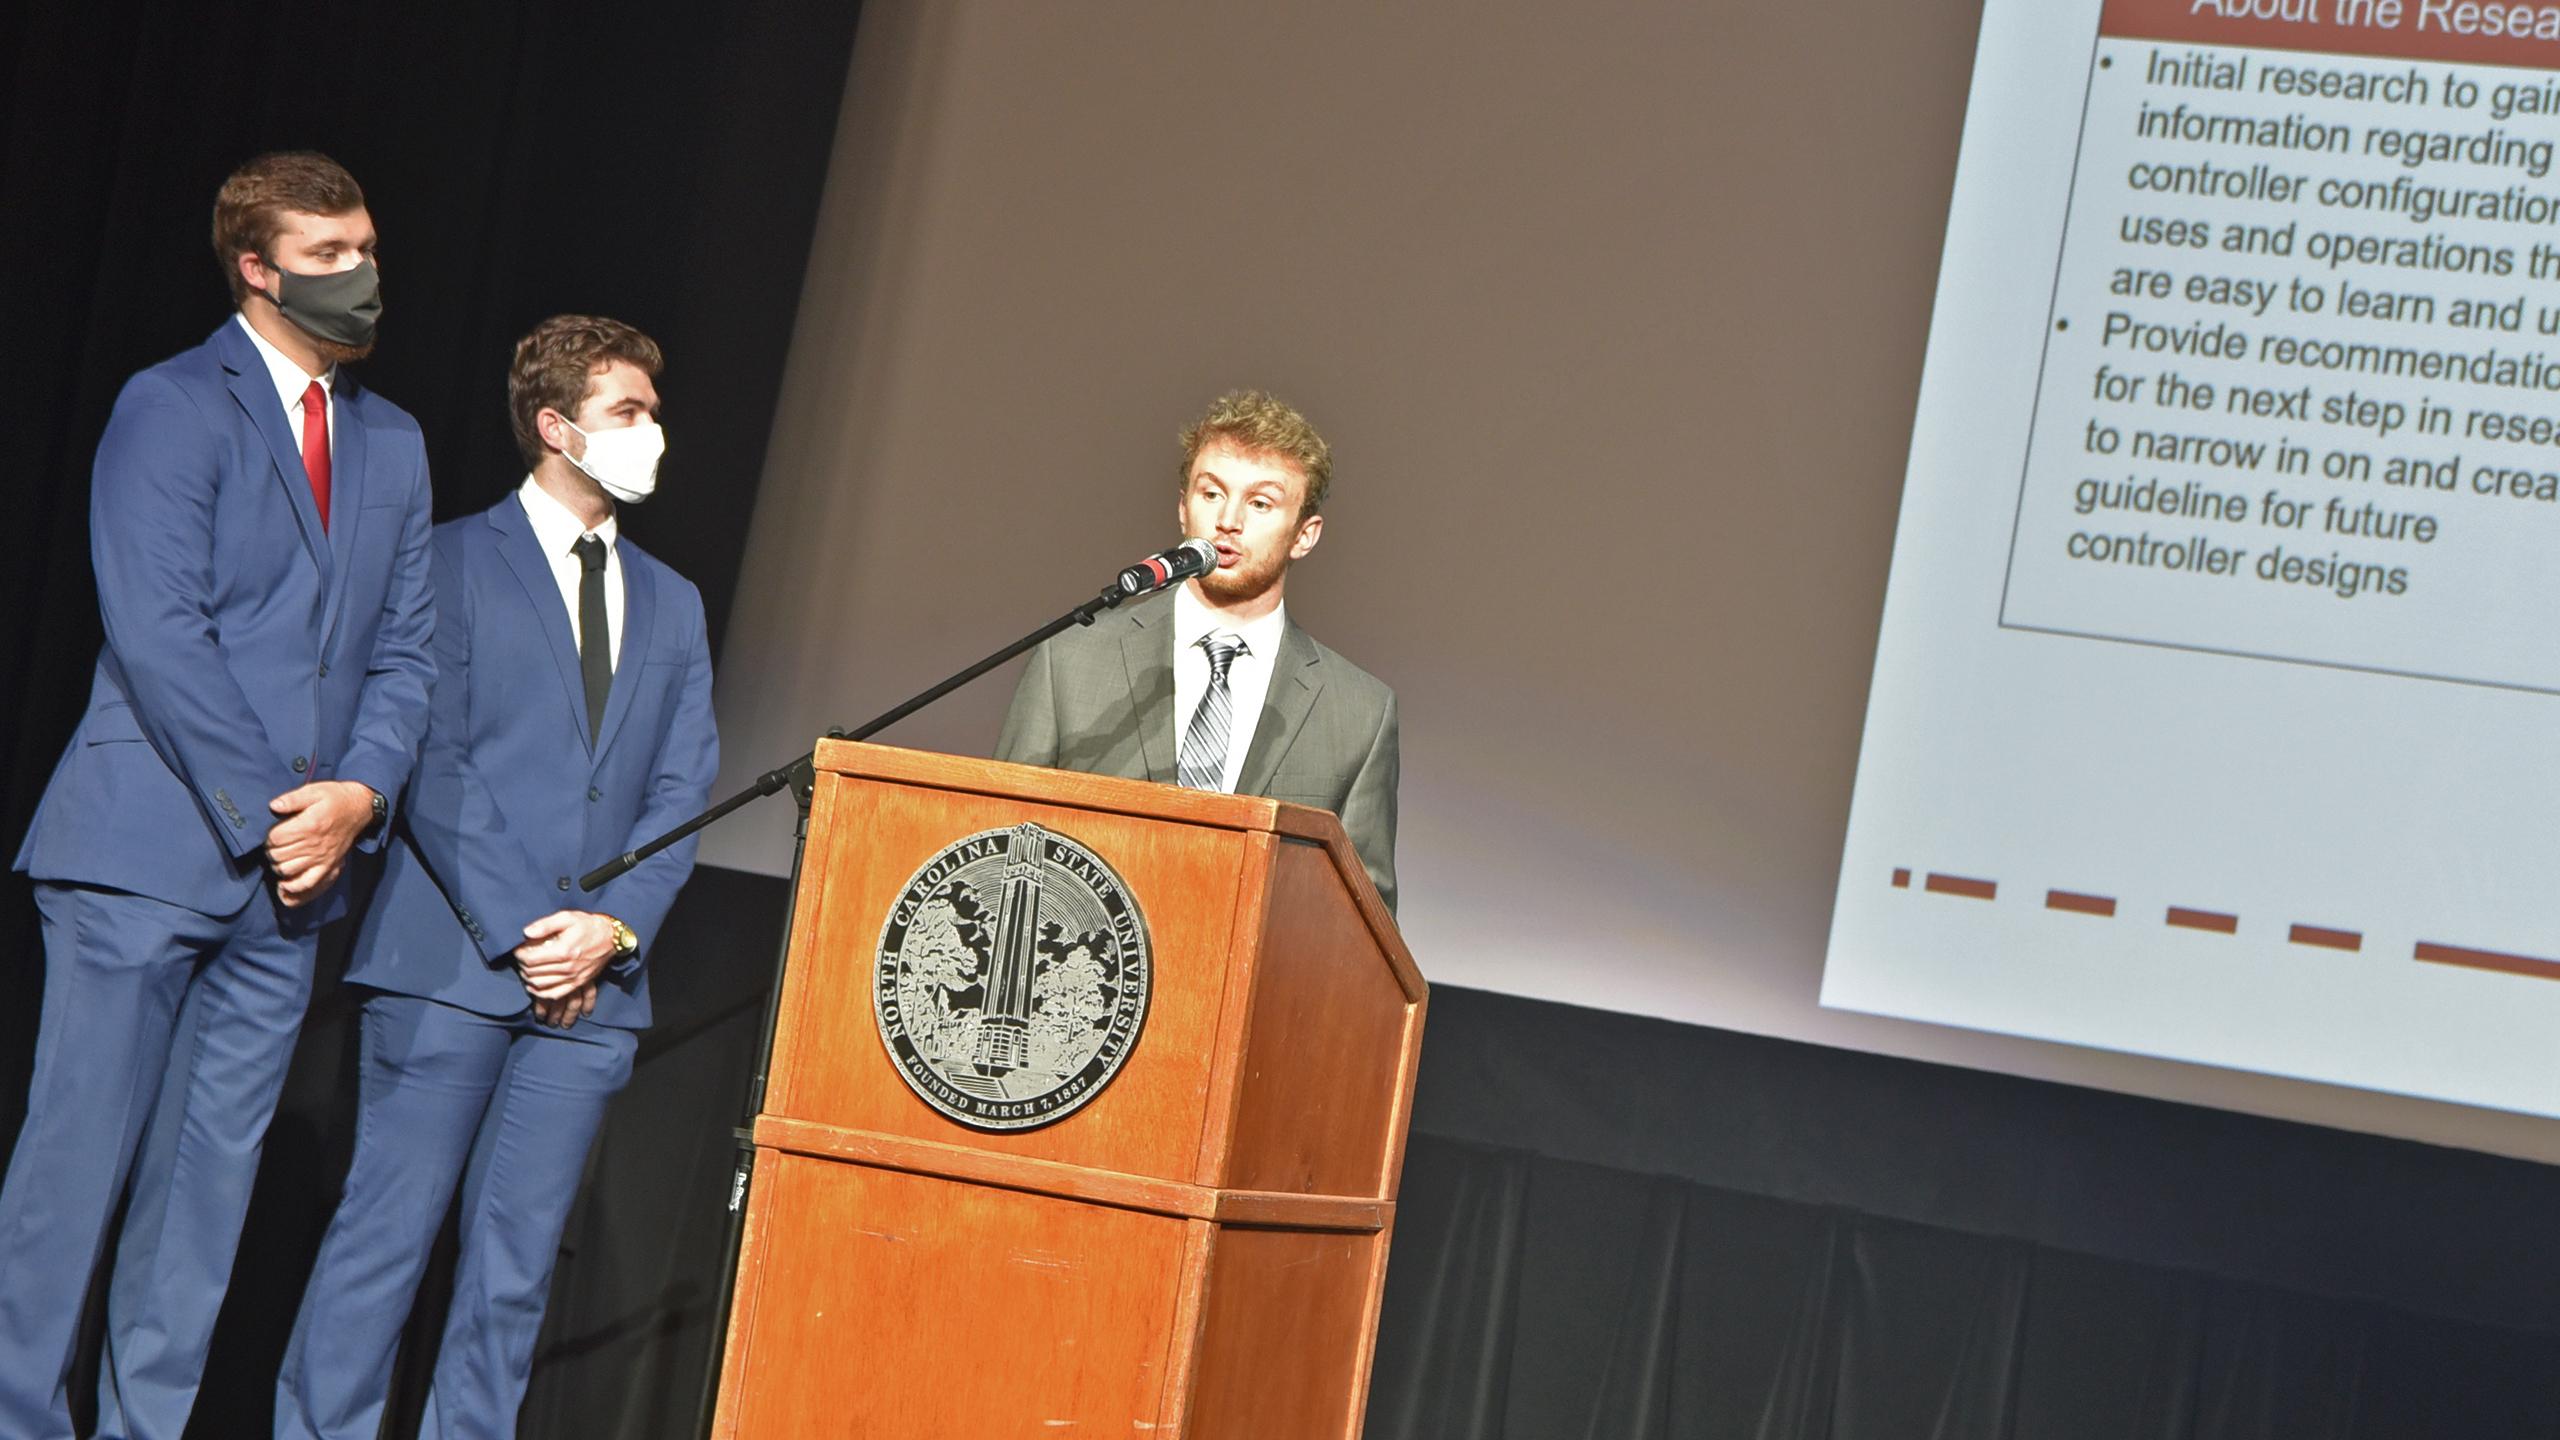 Team NIOSH B giving thier presentation.